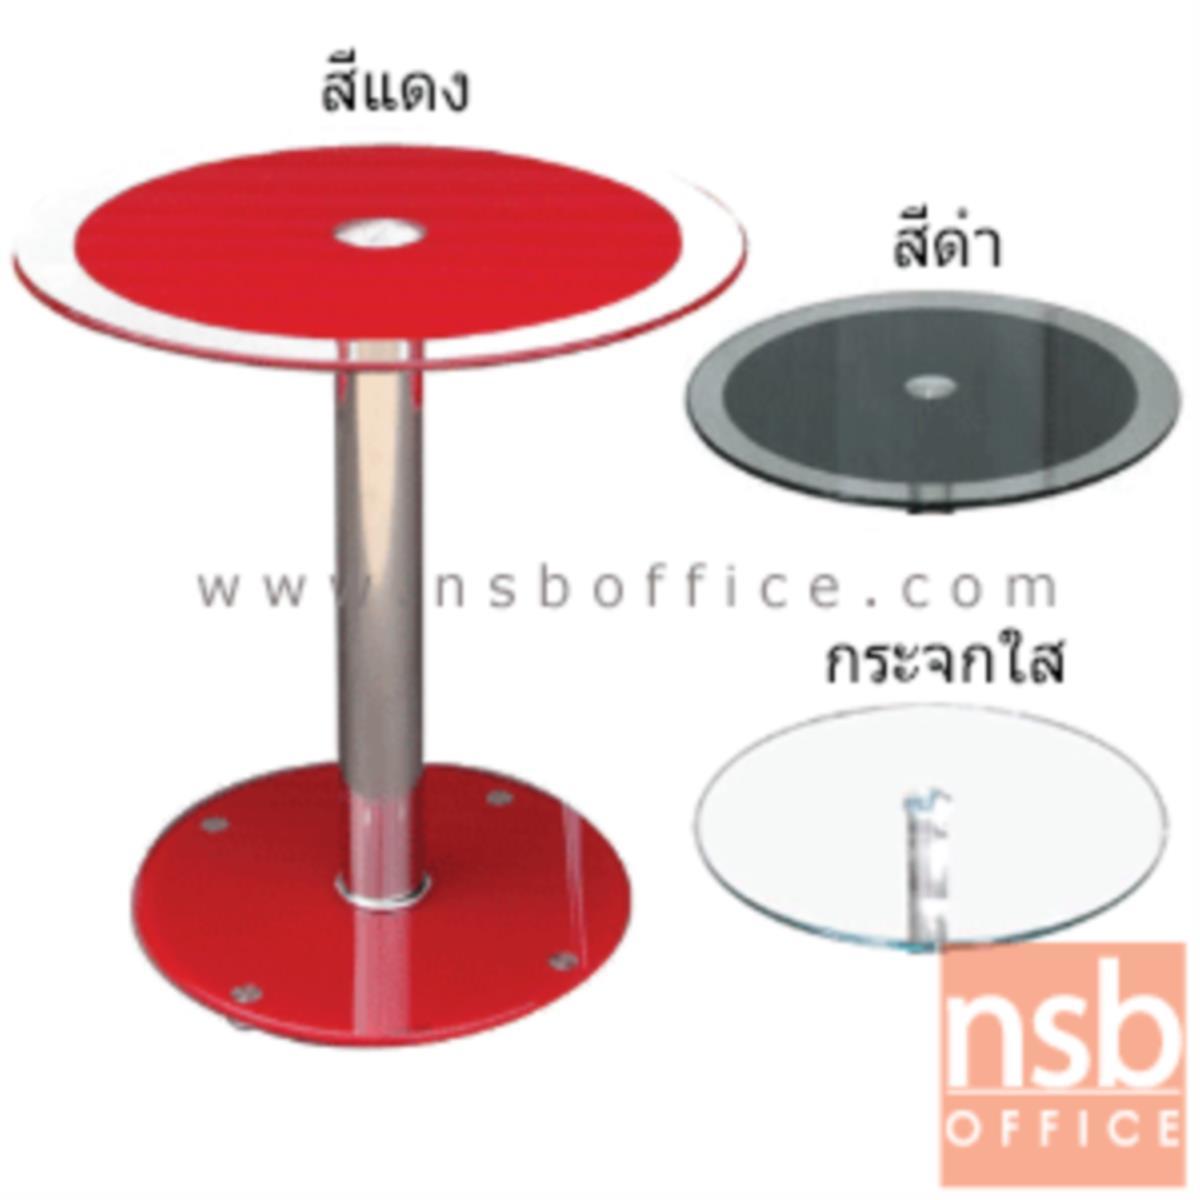 A05A104:โต๊ะกลมหน้ากระจก รุ่น Smirnoff (สเมอร์นอฟฟ์) ขนาด 60Di cm.  ขาสแตนเลส